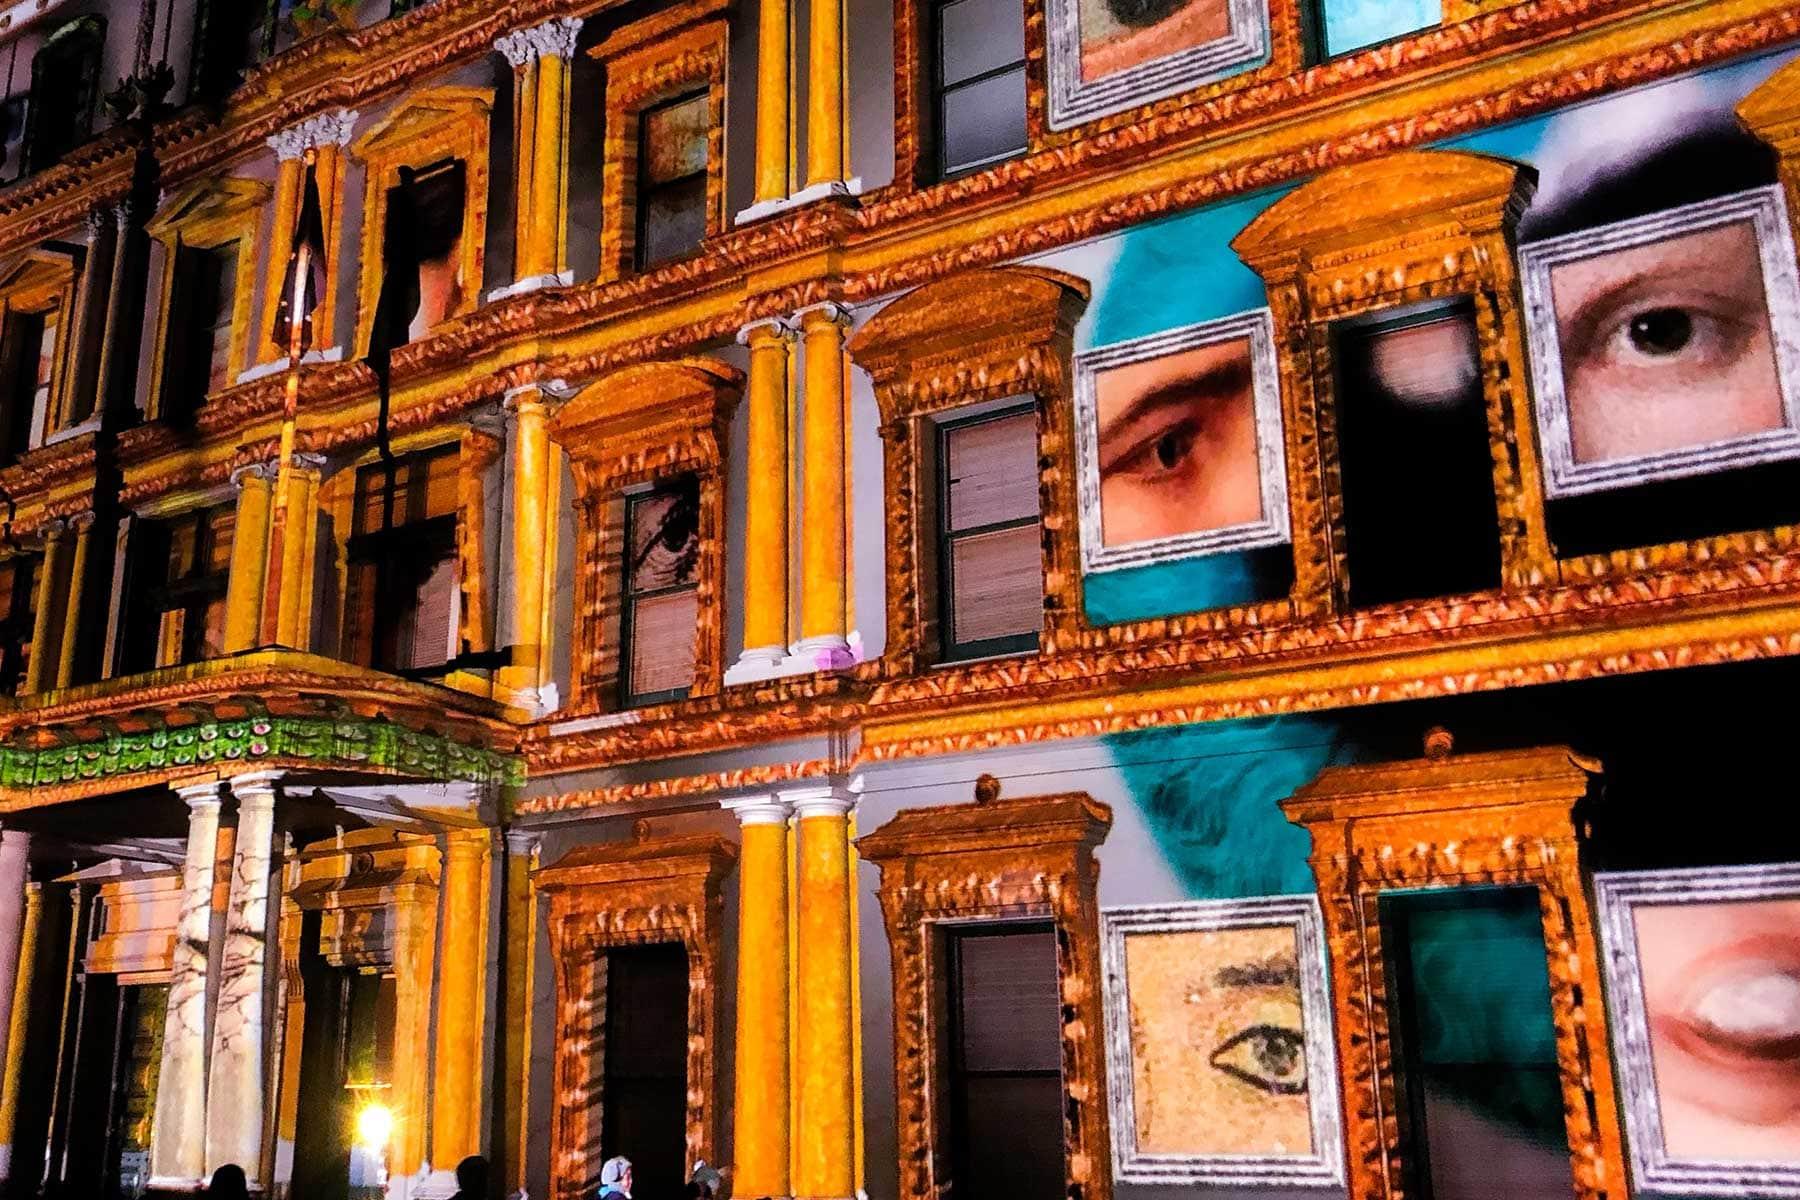 Resor-till-Melbourne-Nygren-Lind-Resebyrå---vägg-med-måleri